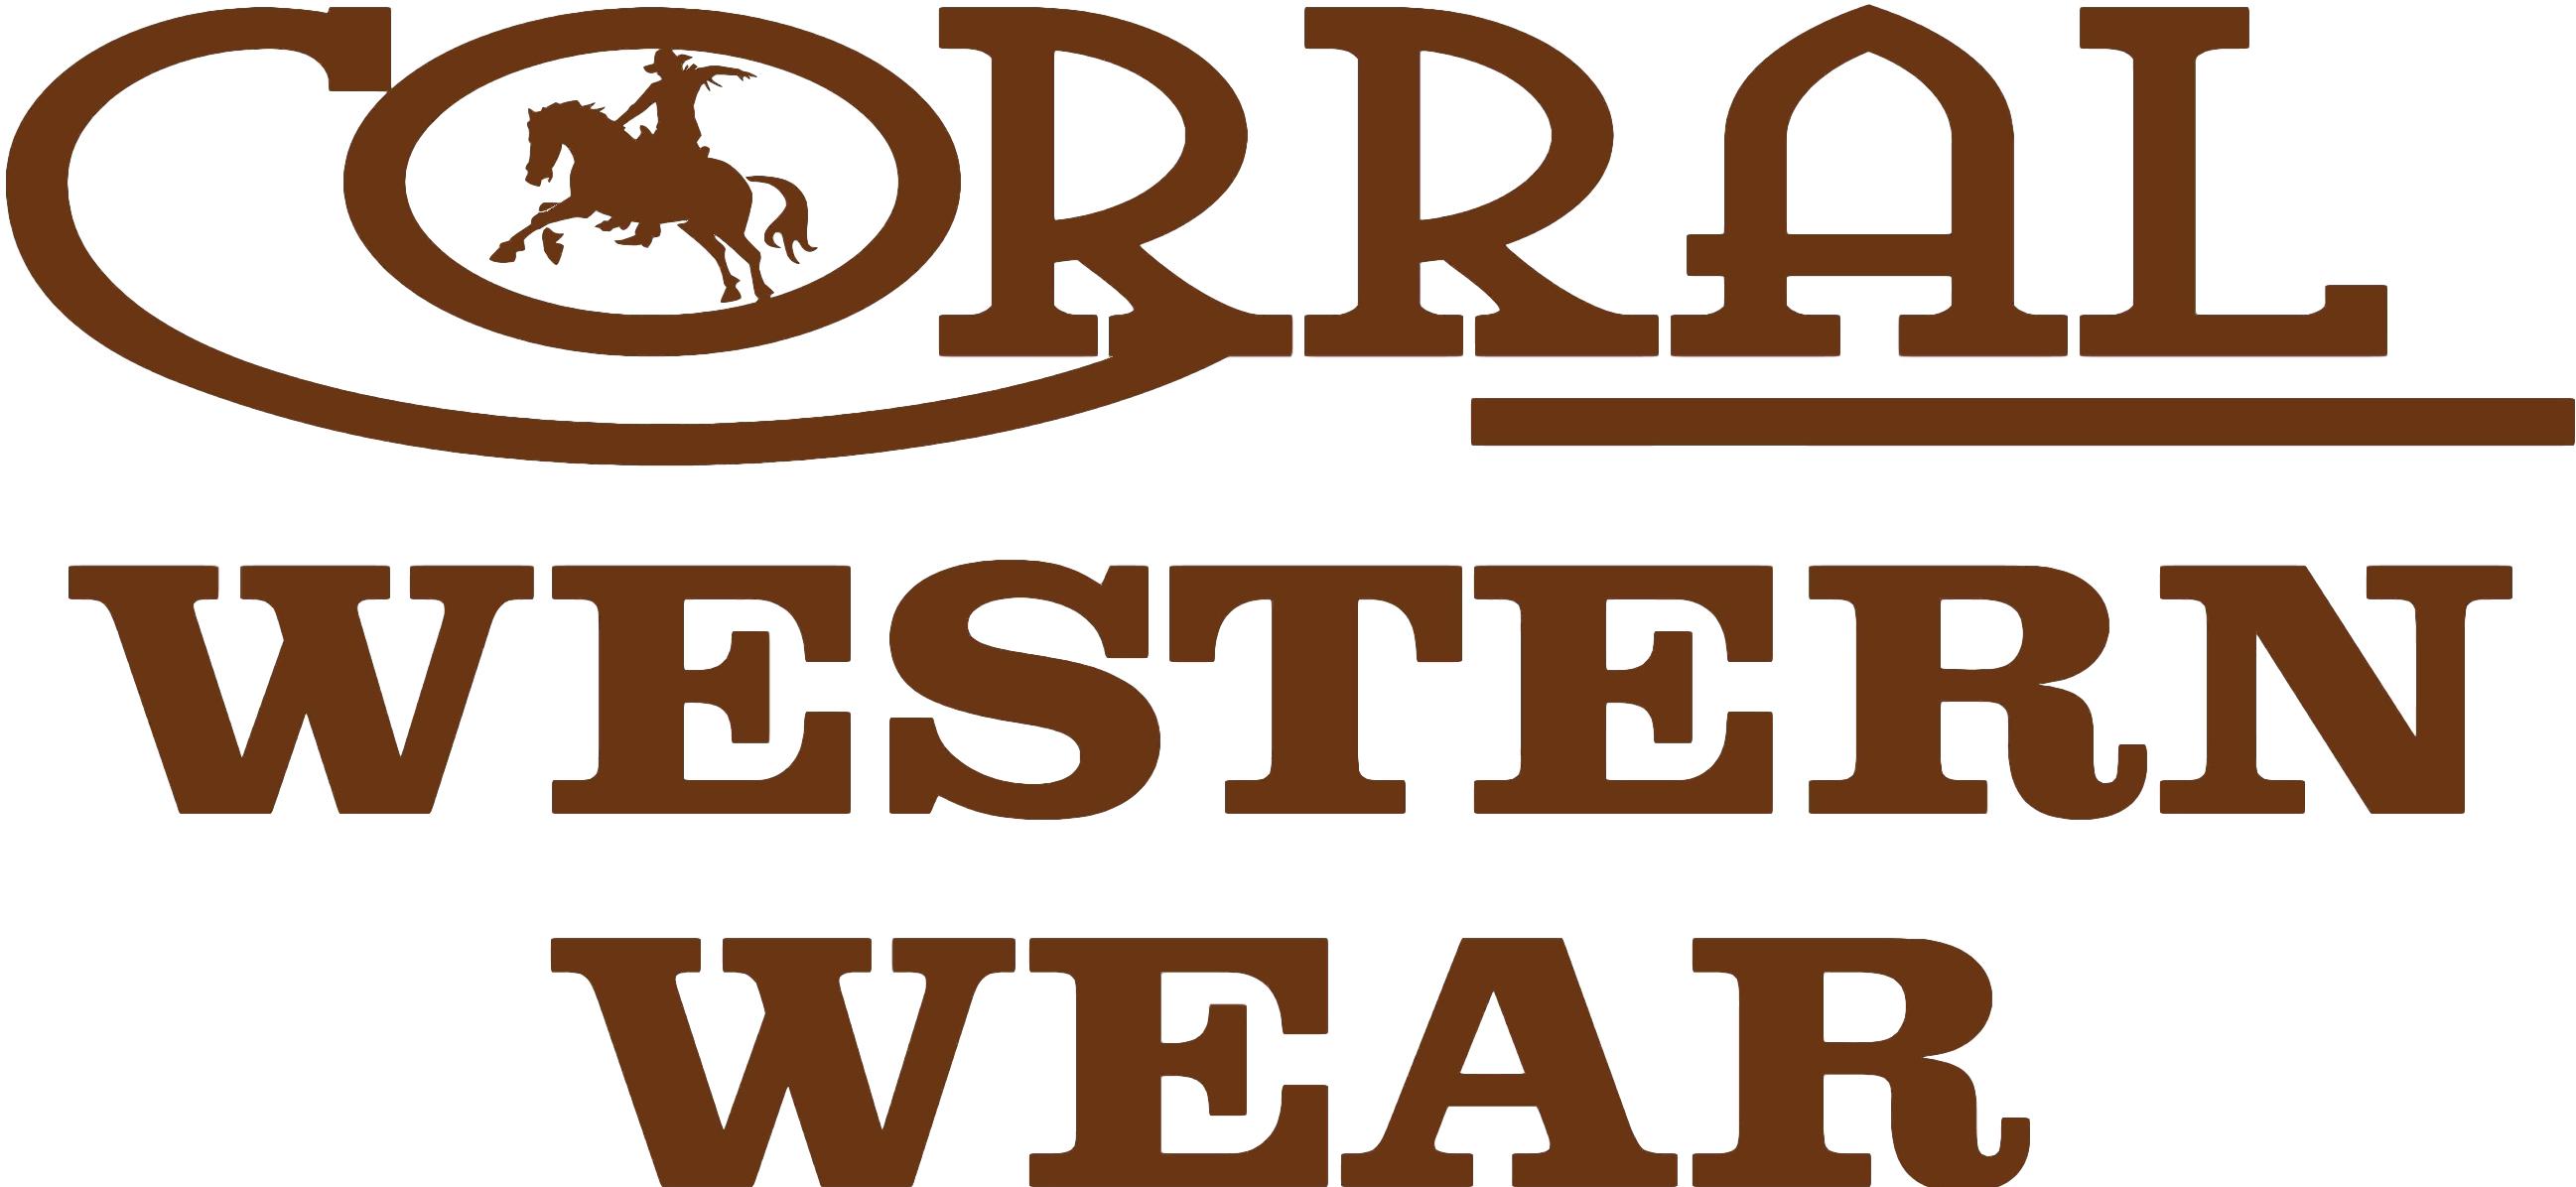 Corral Western Wear